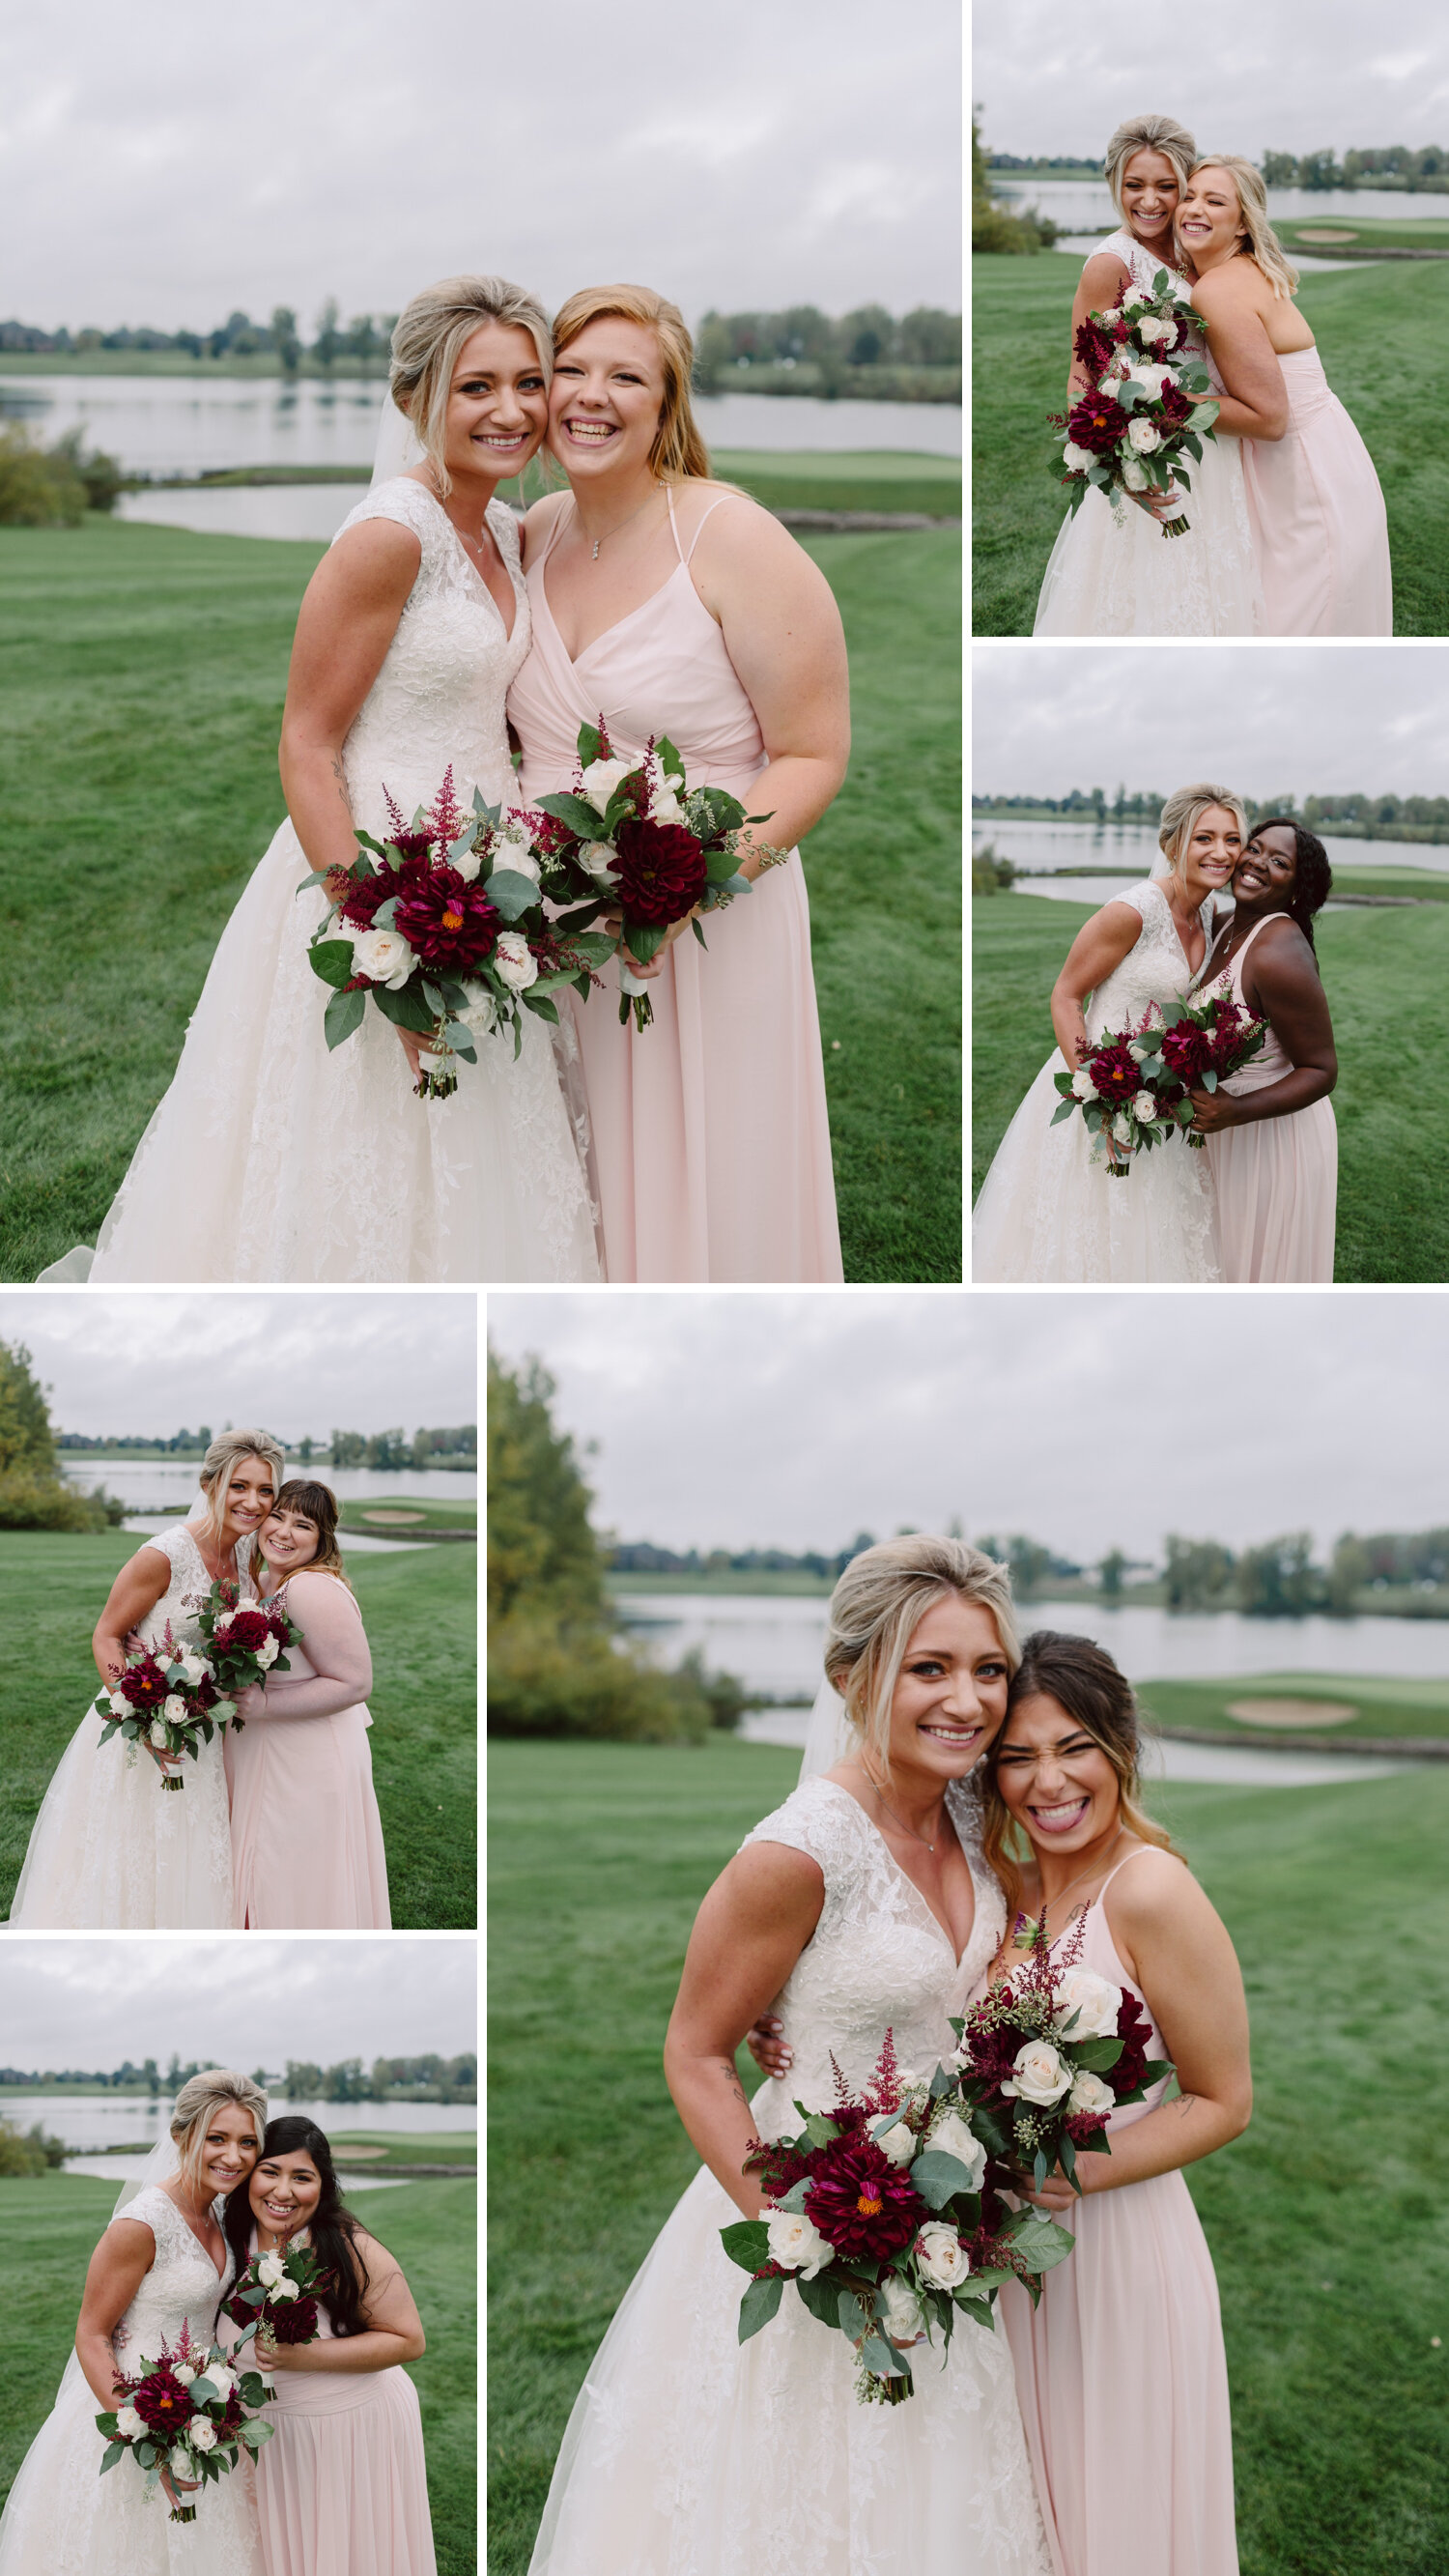 Brides pose with bridesmaids